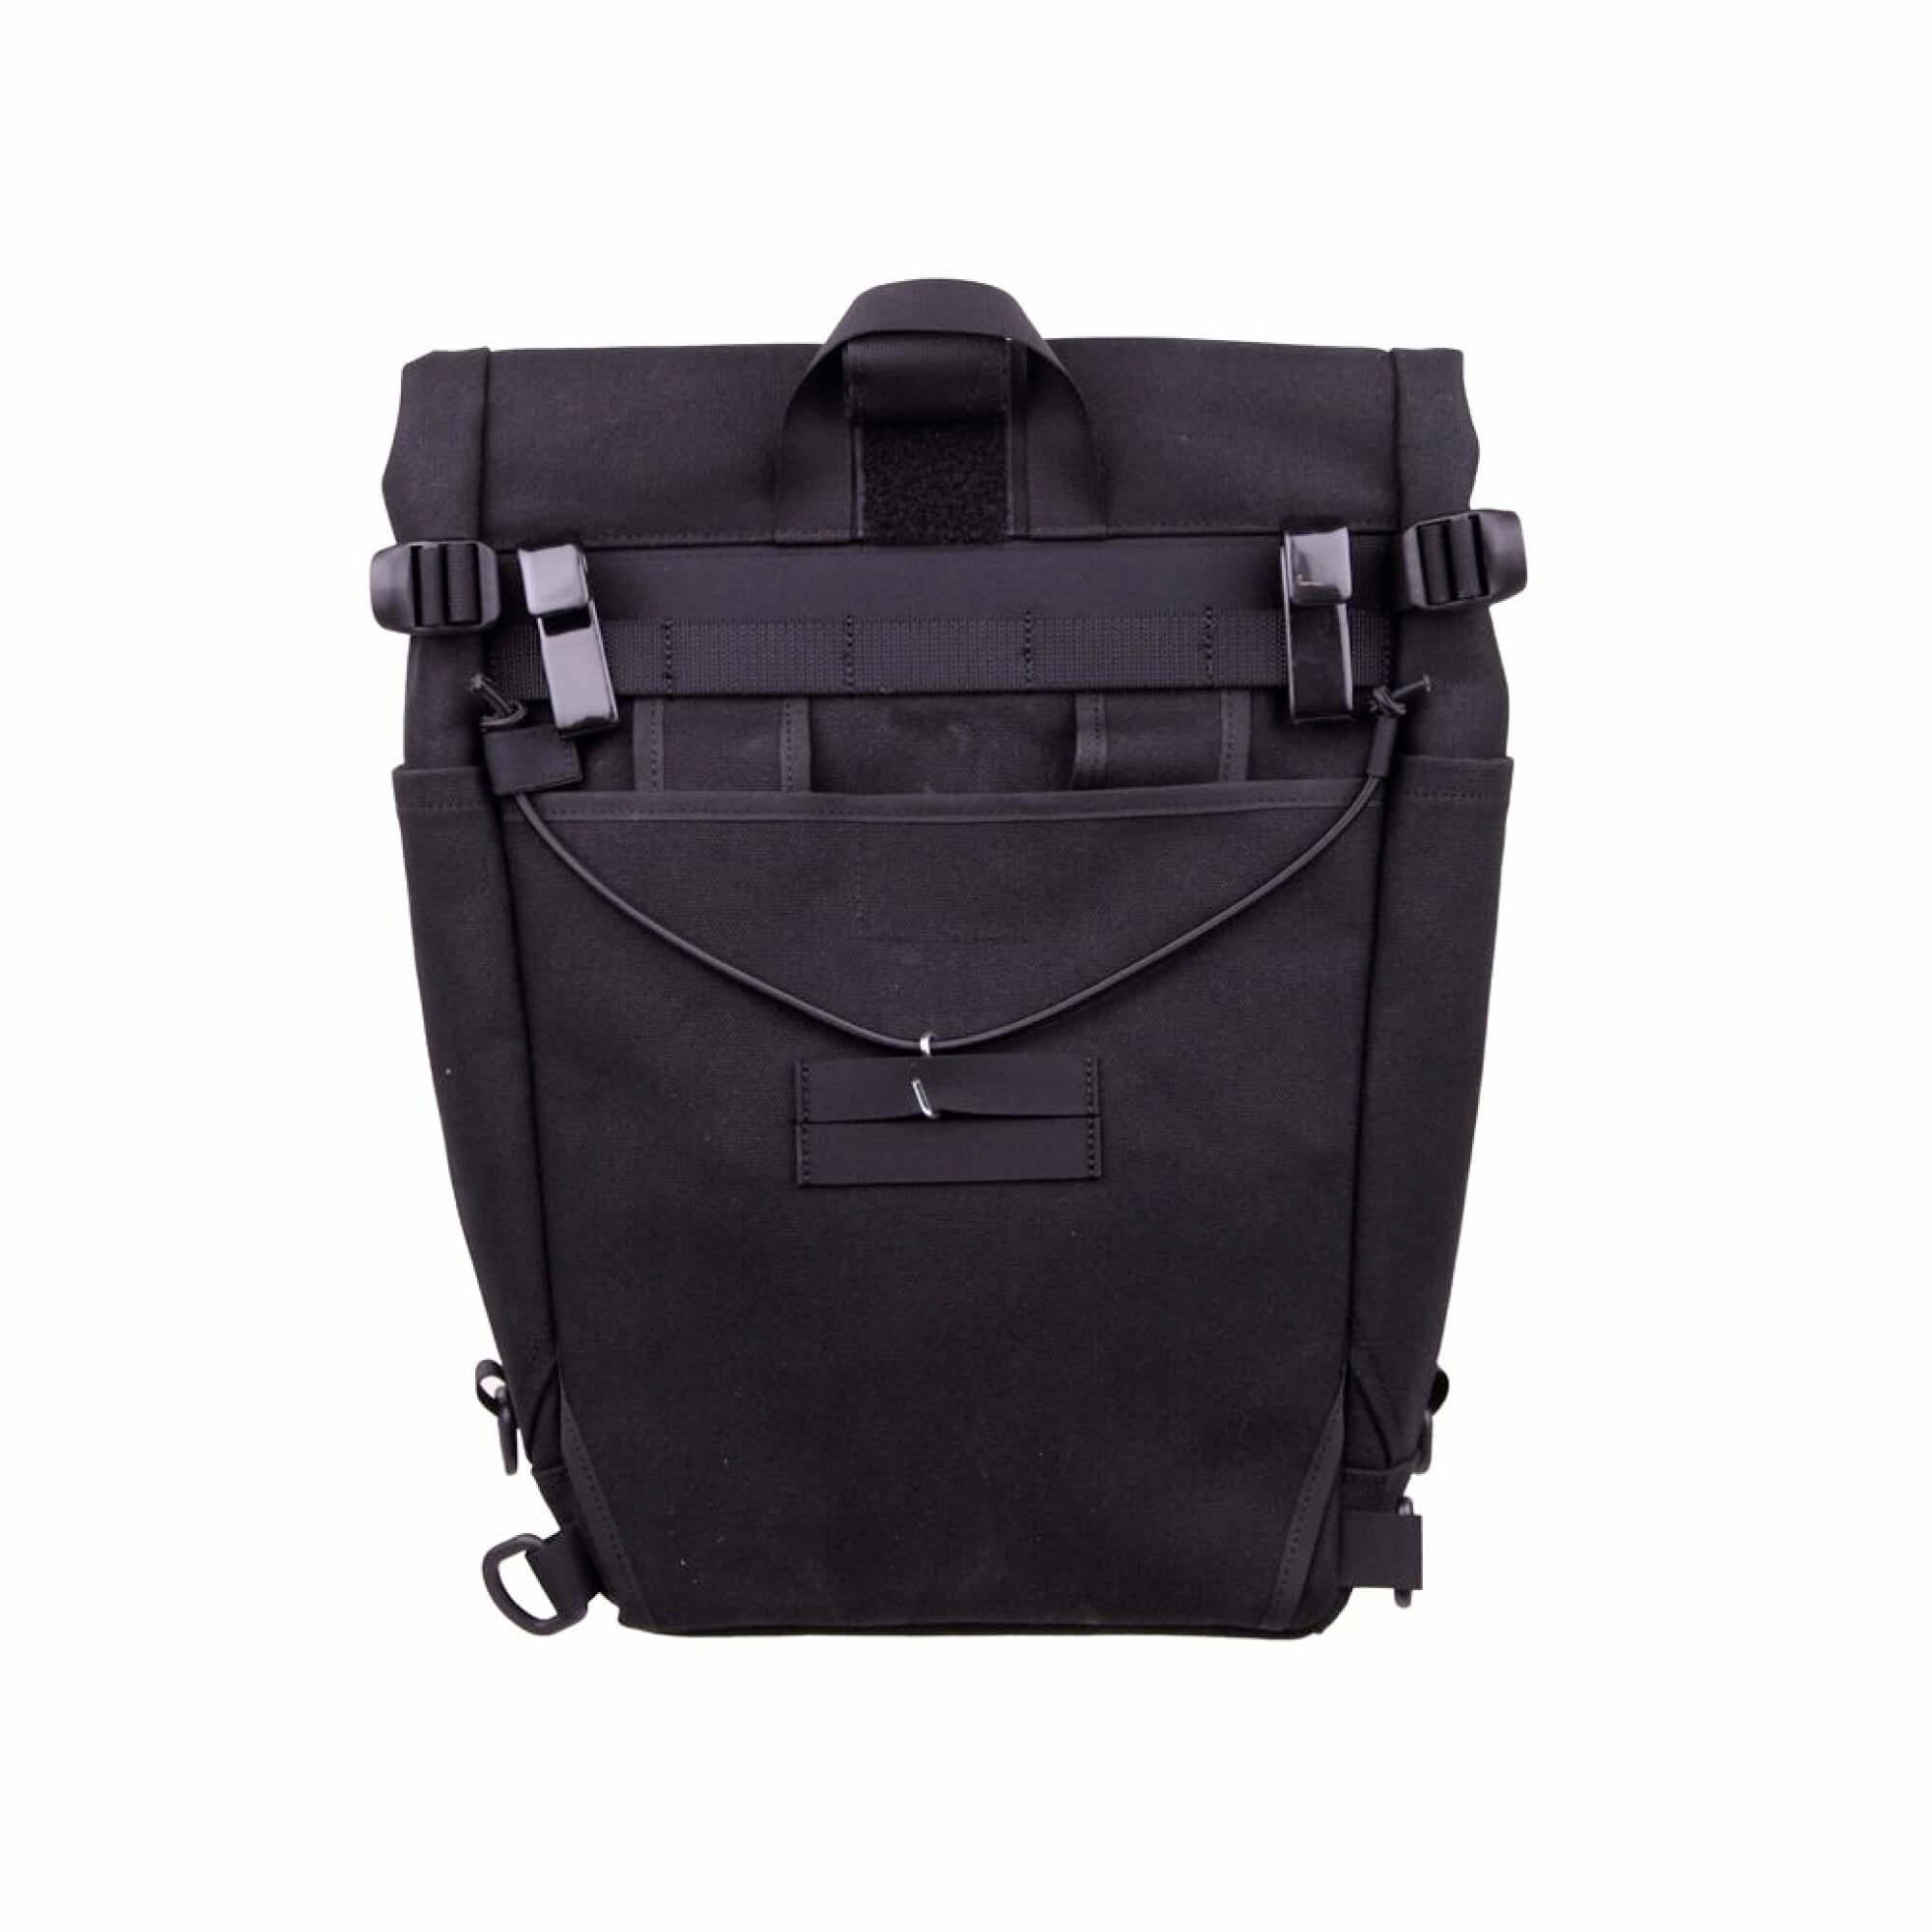 Roll Top Pannier Bag Black-3